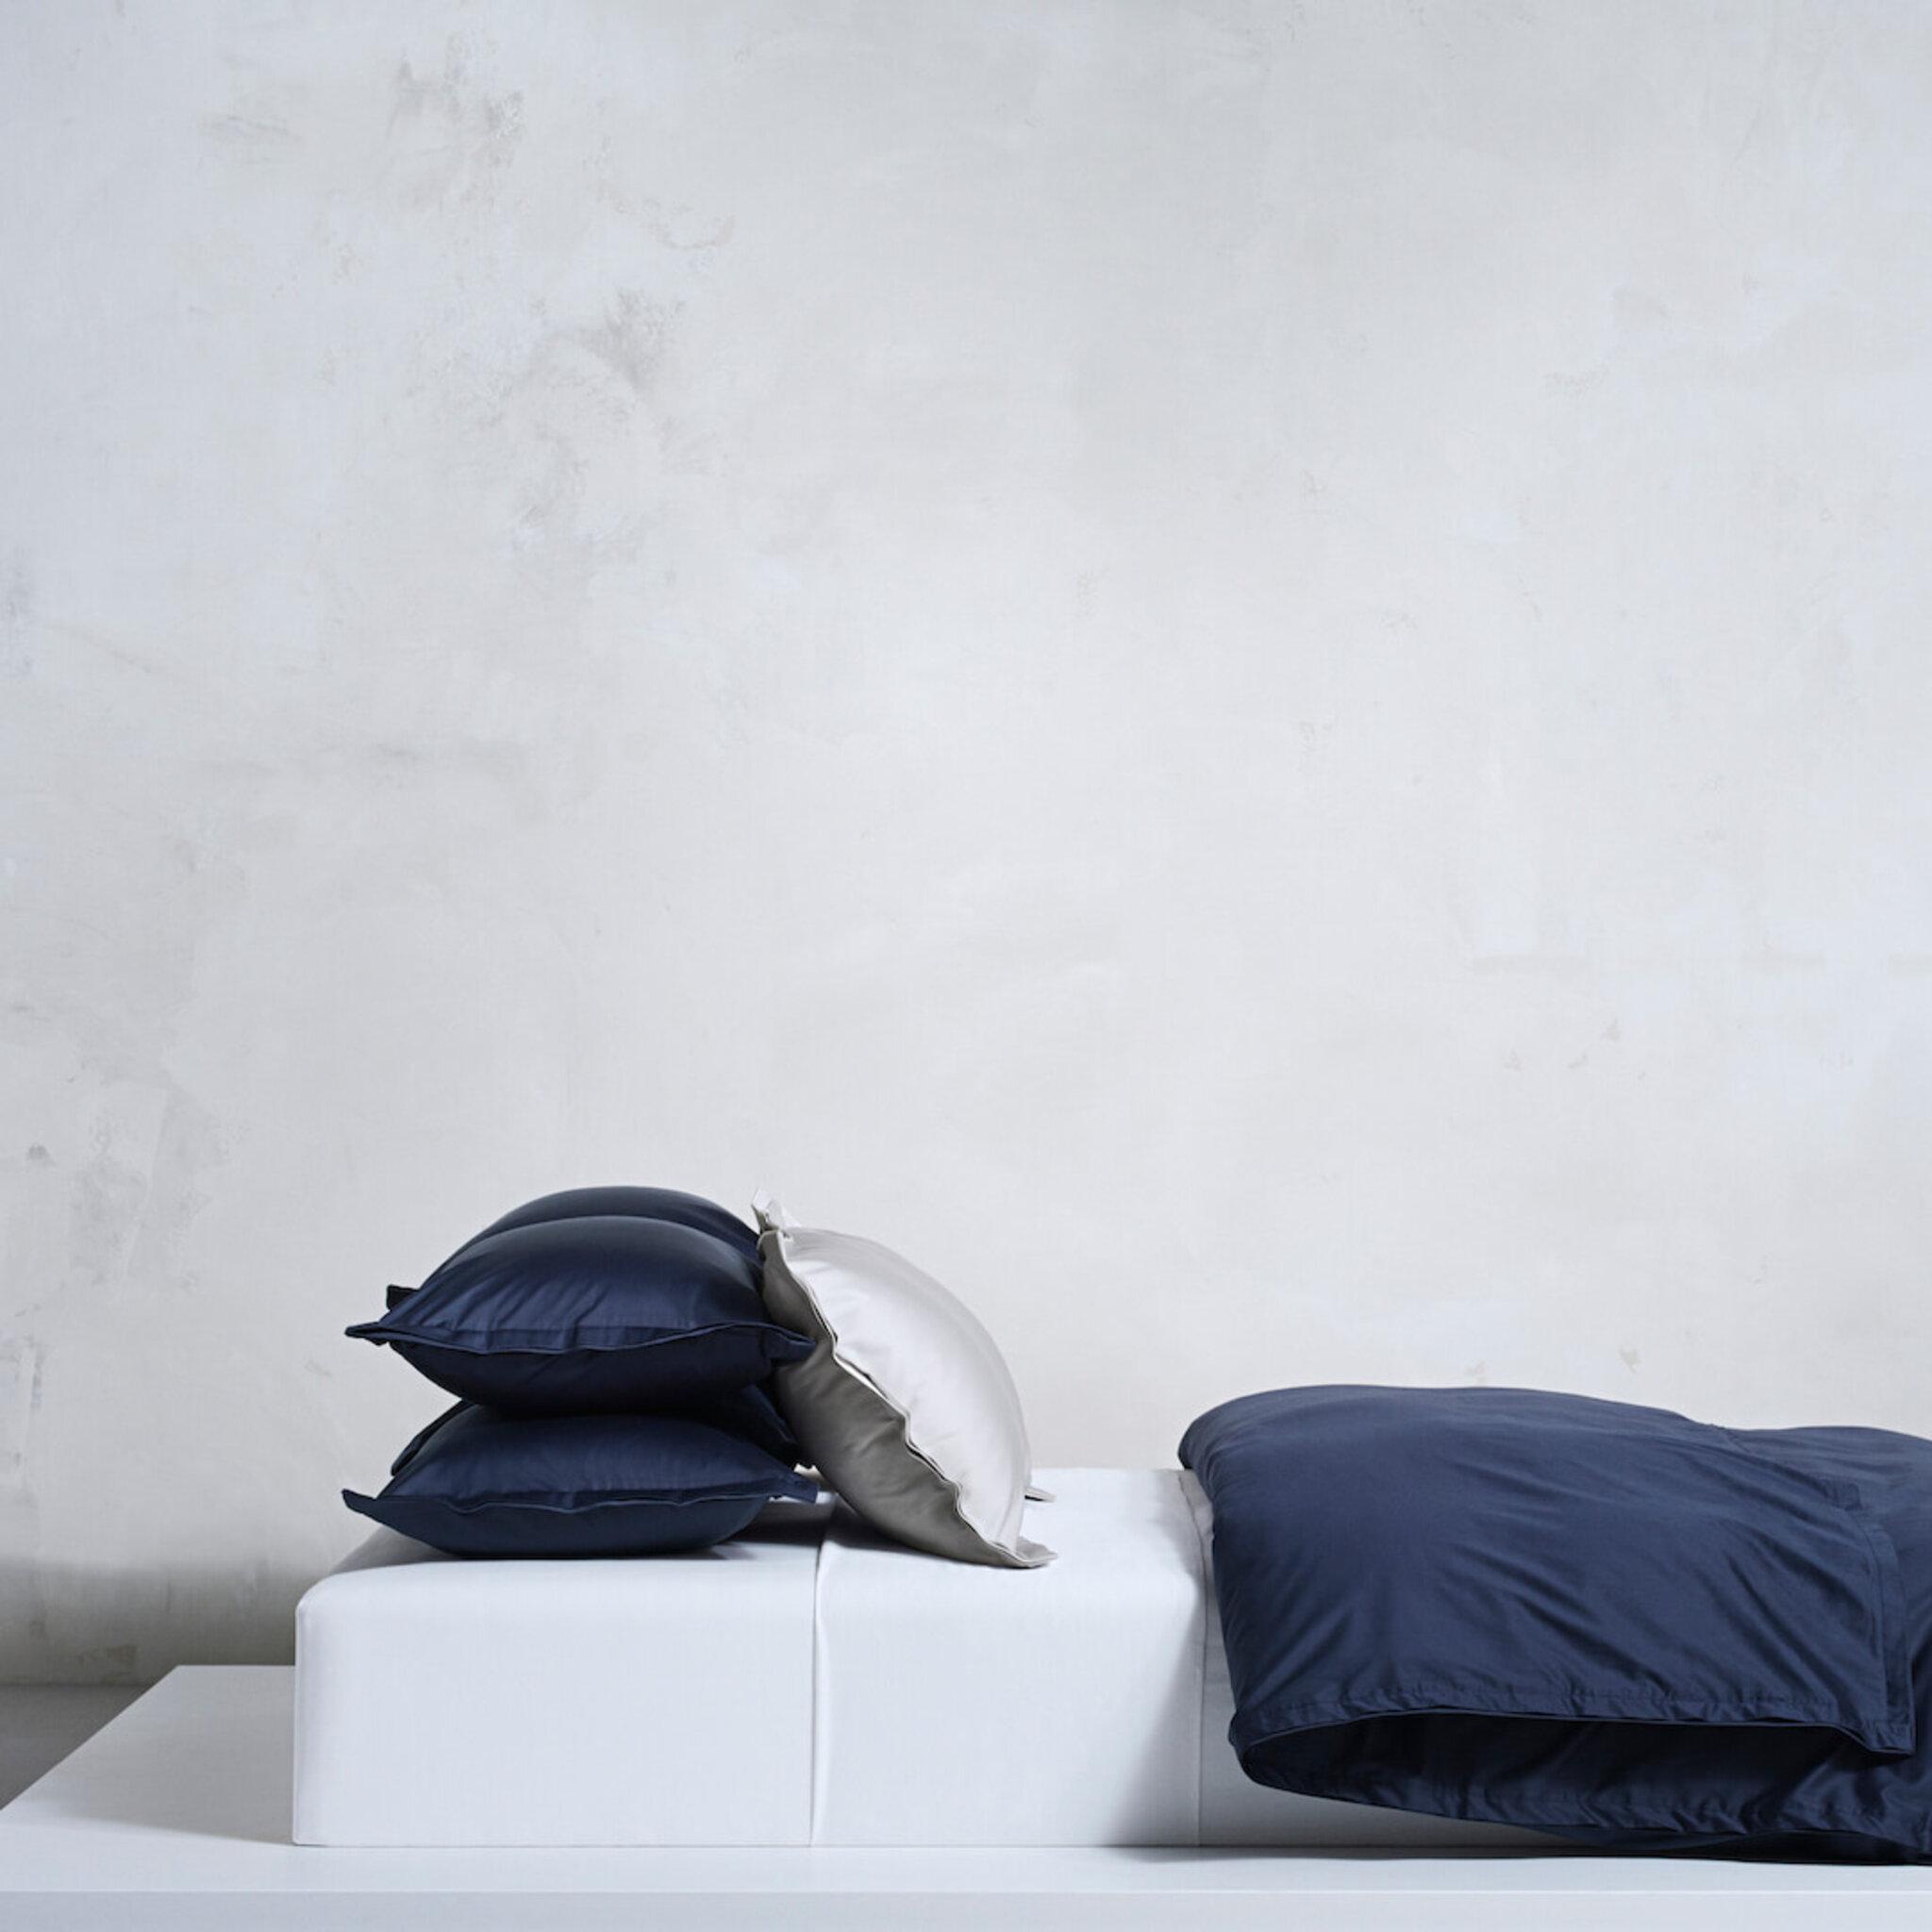 Barton Double Duvet Cover, 220x220 cm